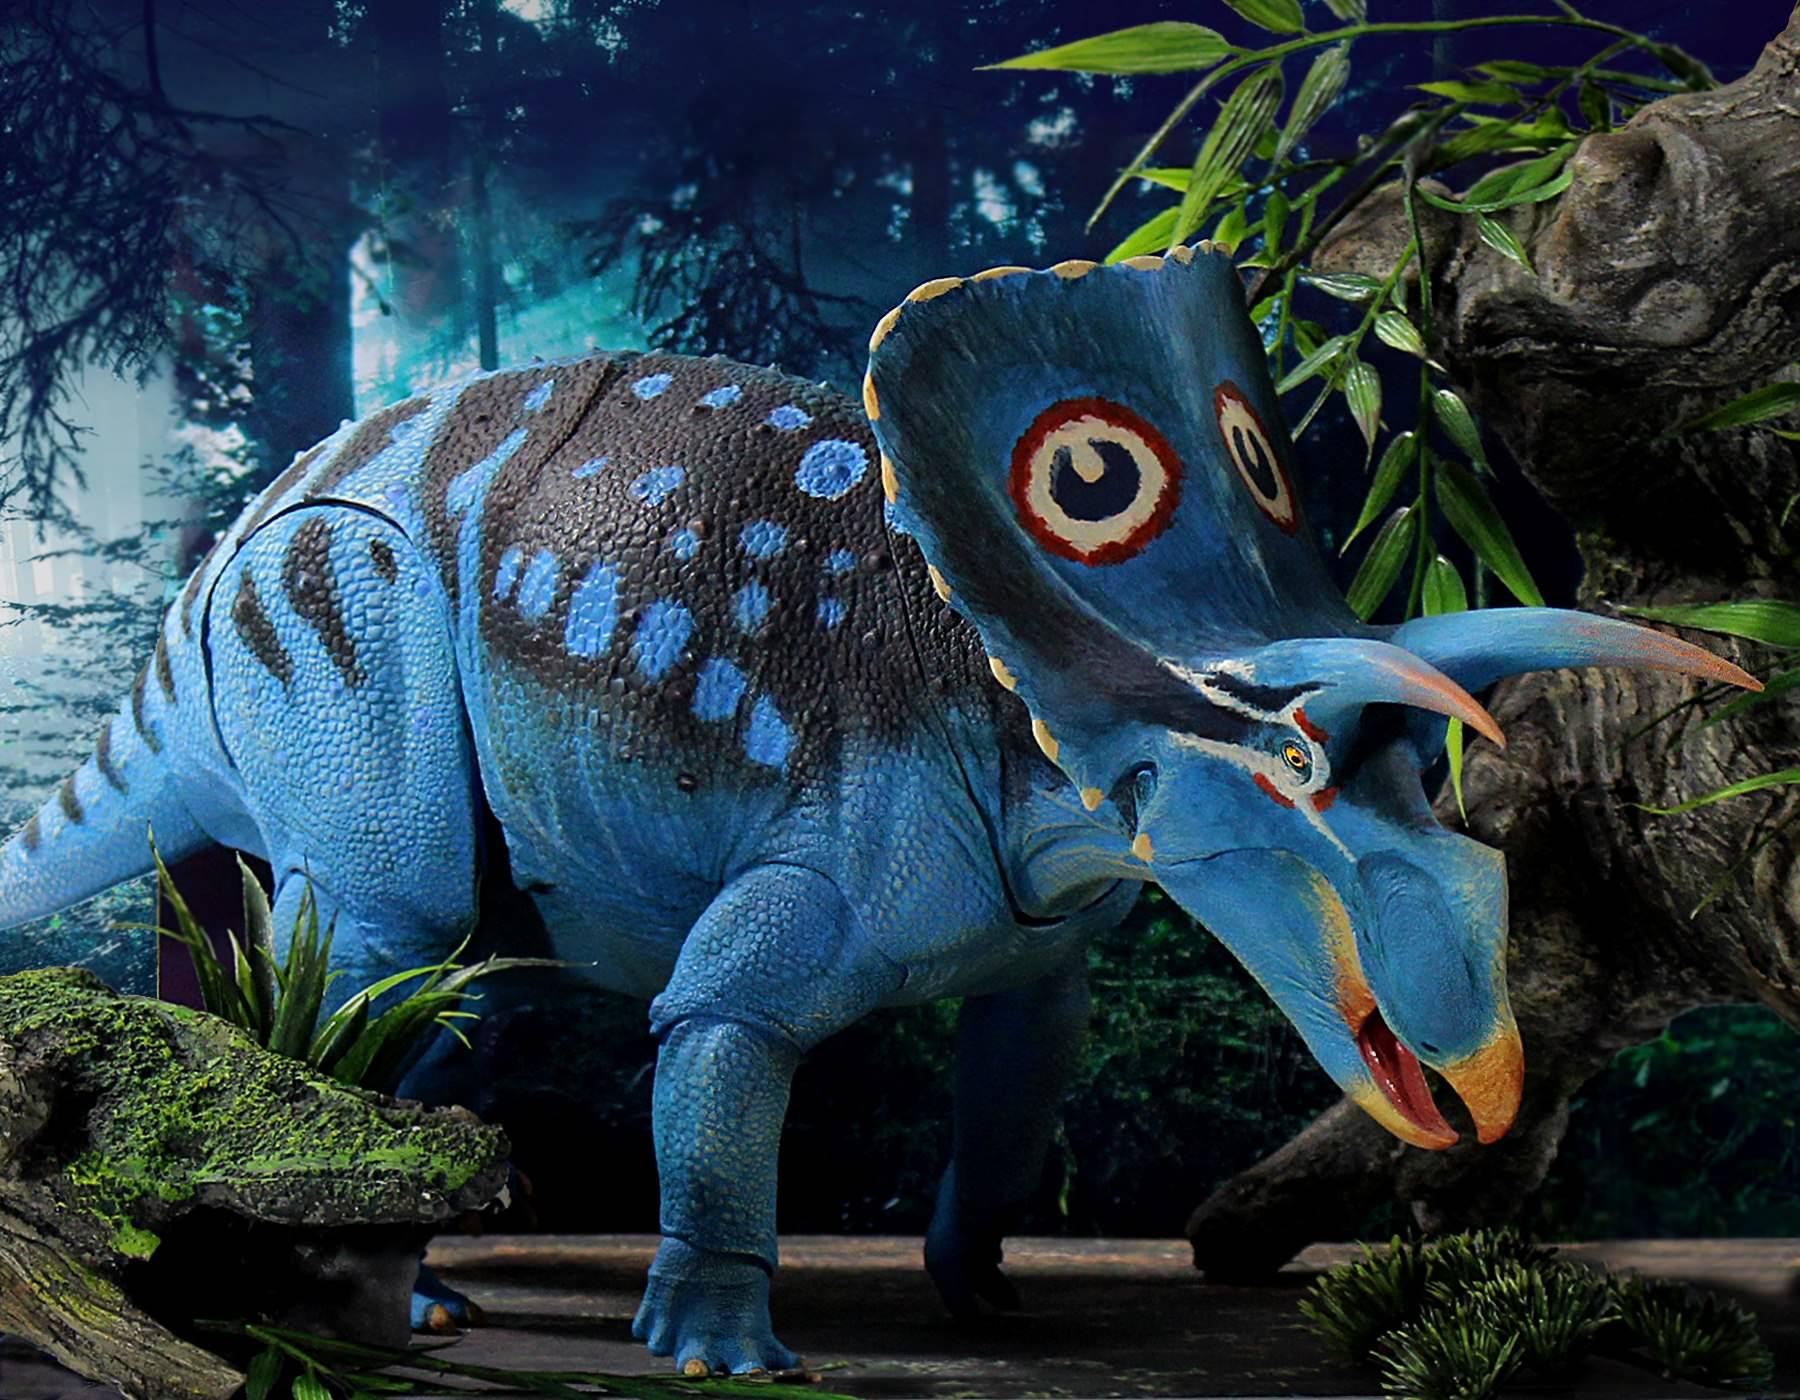 A Mesozoic Mosaic: Centrosaurus and Styracosaurus